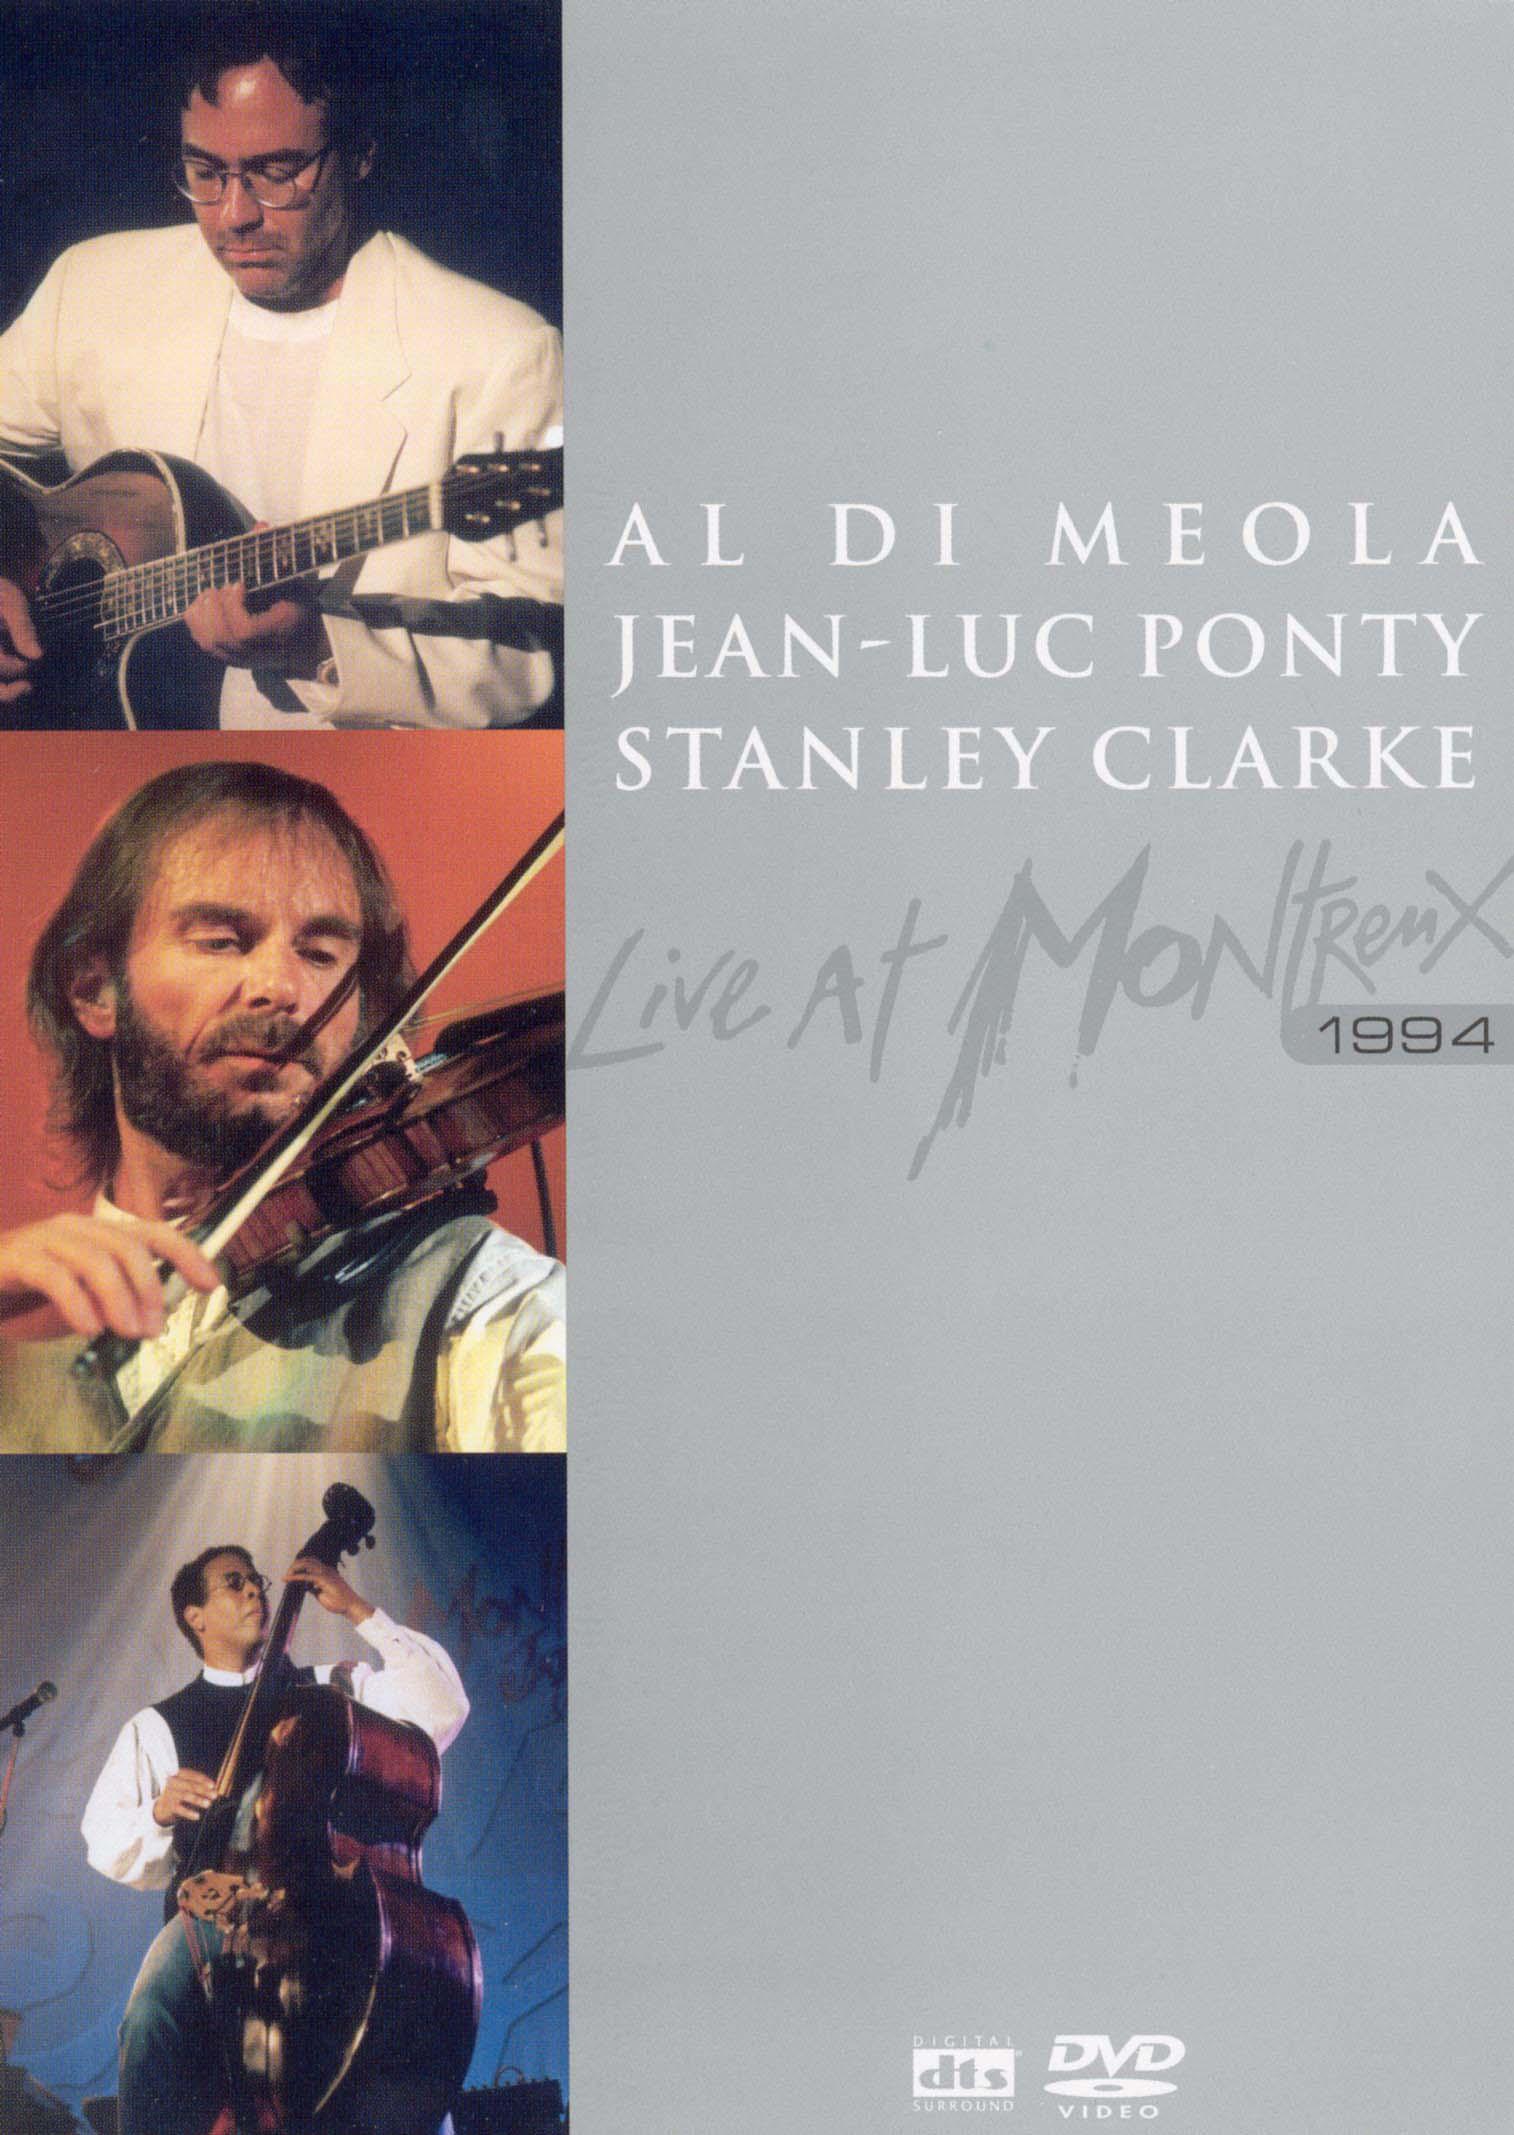 Al Di Meola/Stanley Clarke/Jean-Luc Ponty: Live at Montreux 1994